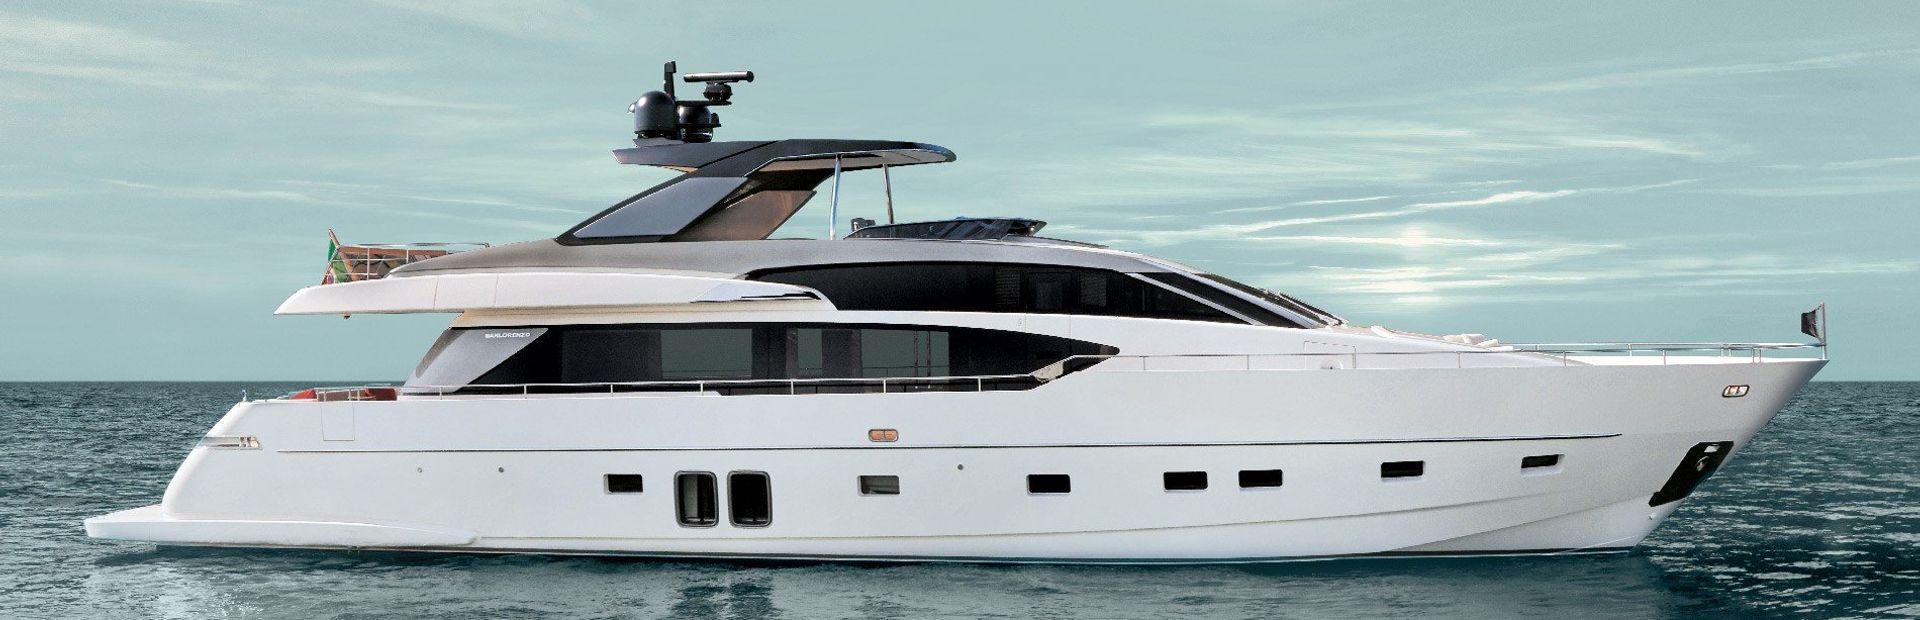 SL86 Yacht Charter